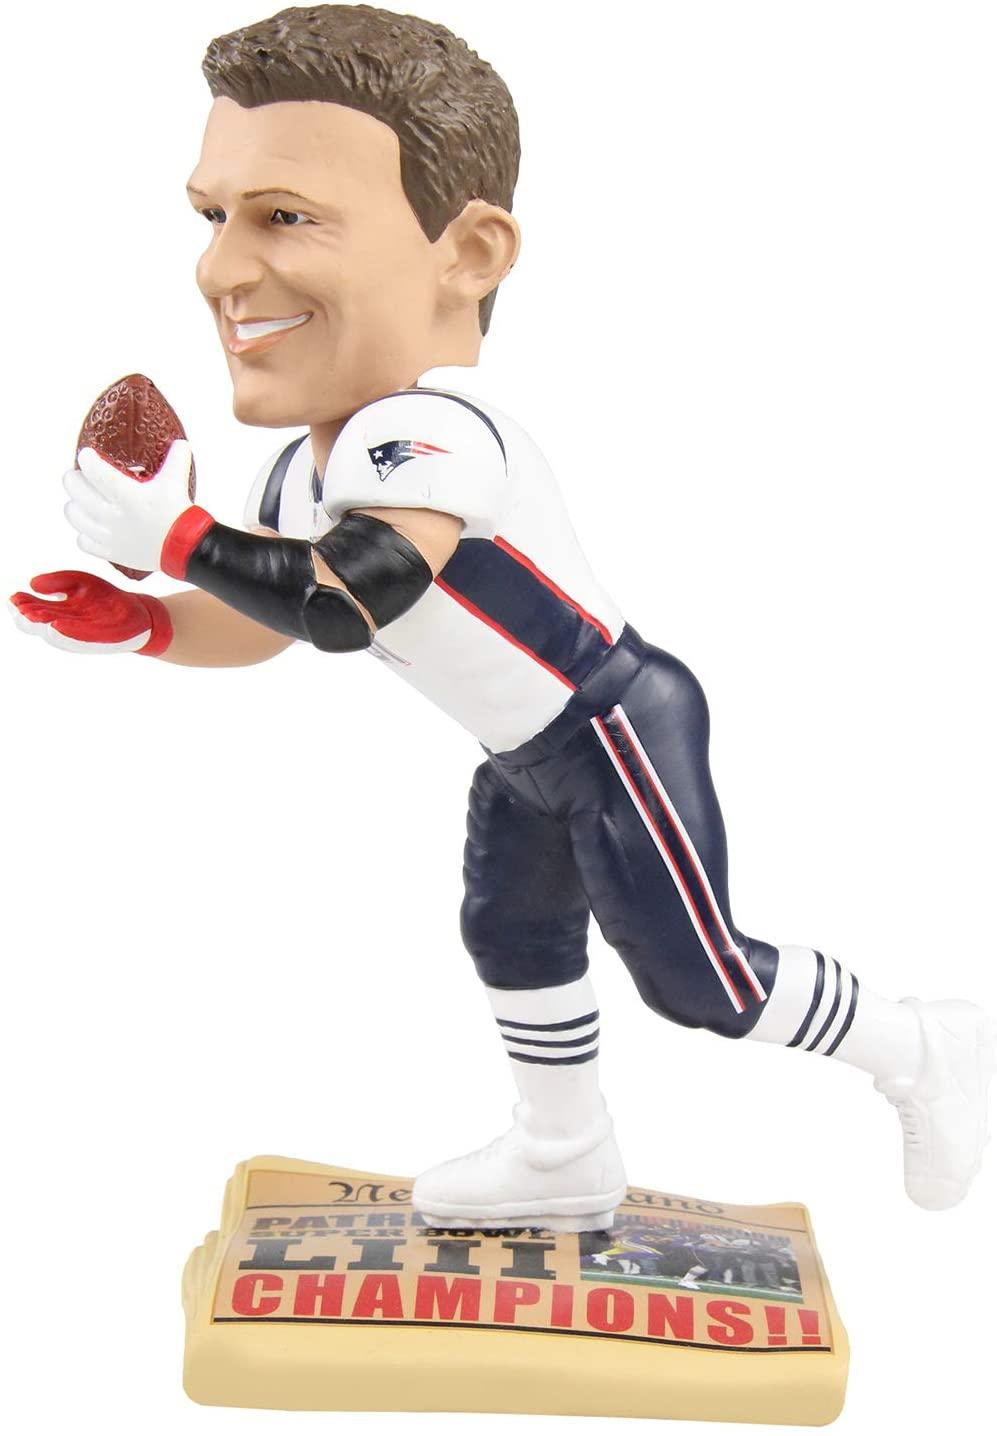 Rob Gronkowski (New England Patriots) Iconic Super Bowl LIII Moment Bobblehead by Foco